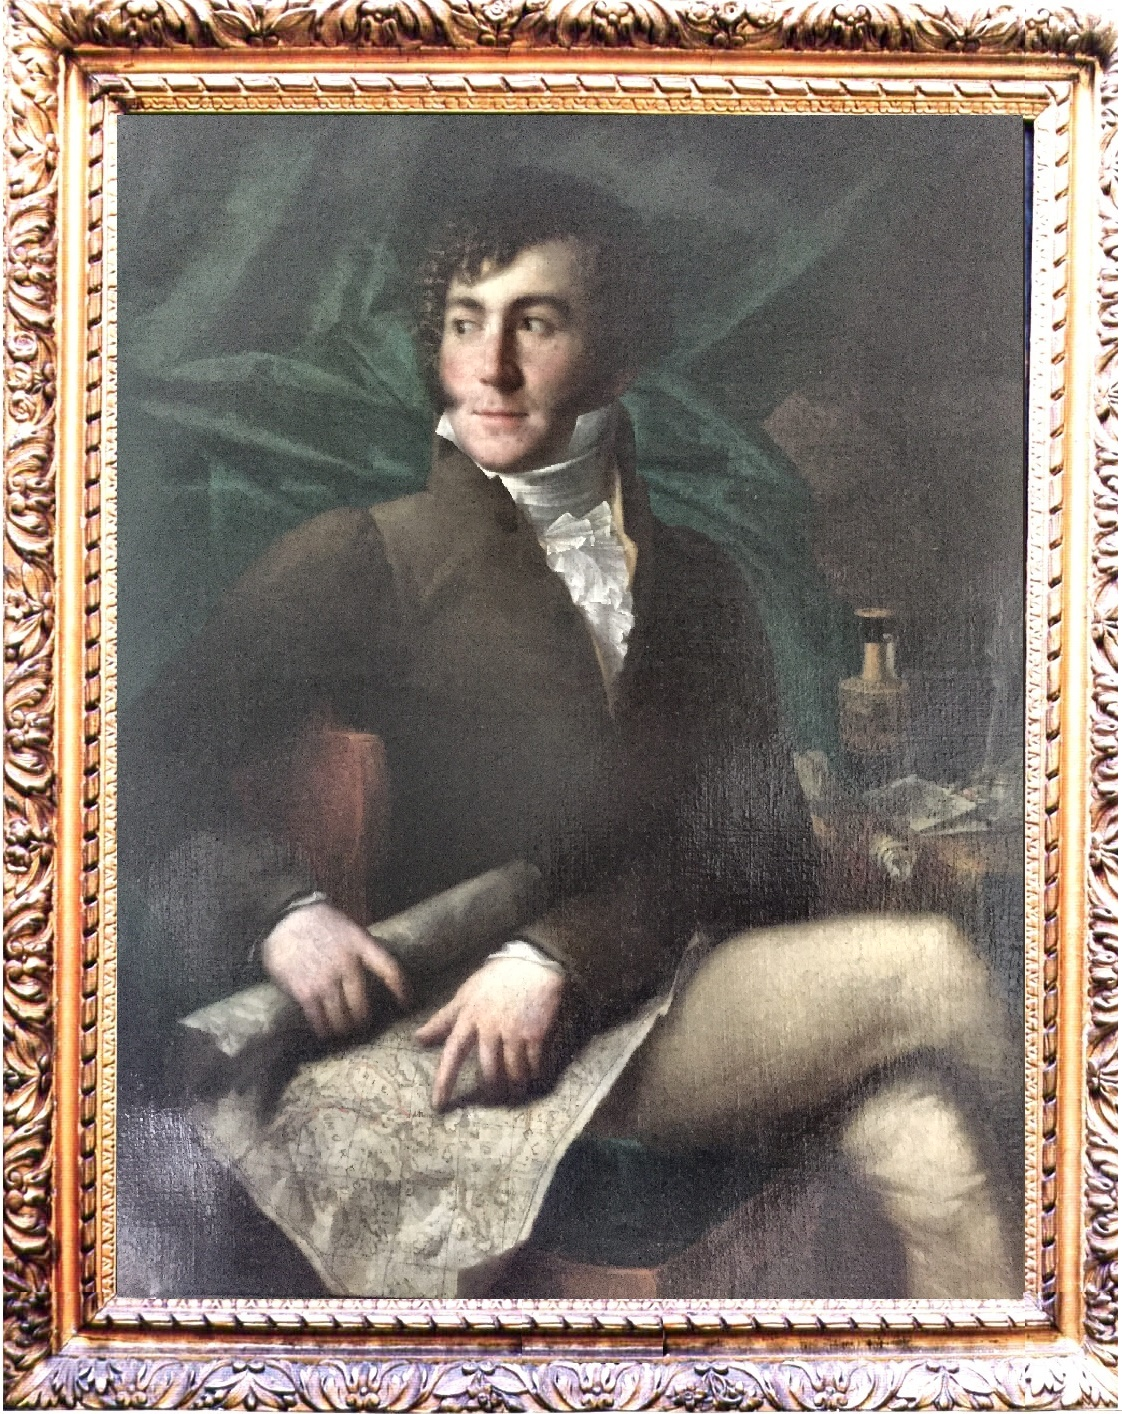 Barrois-Francois-Joseph